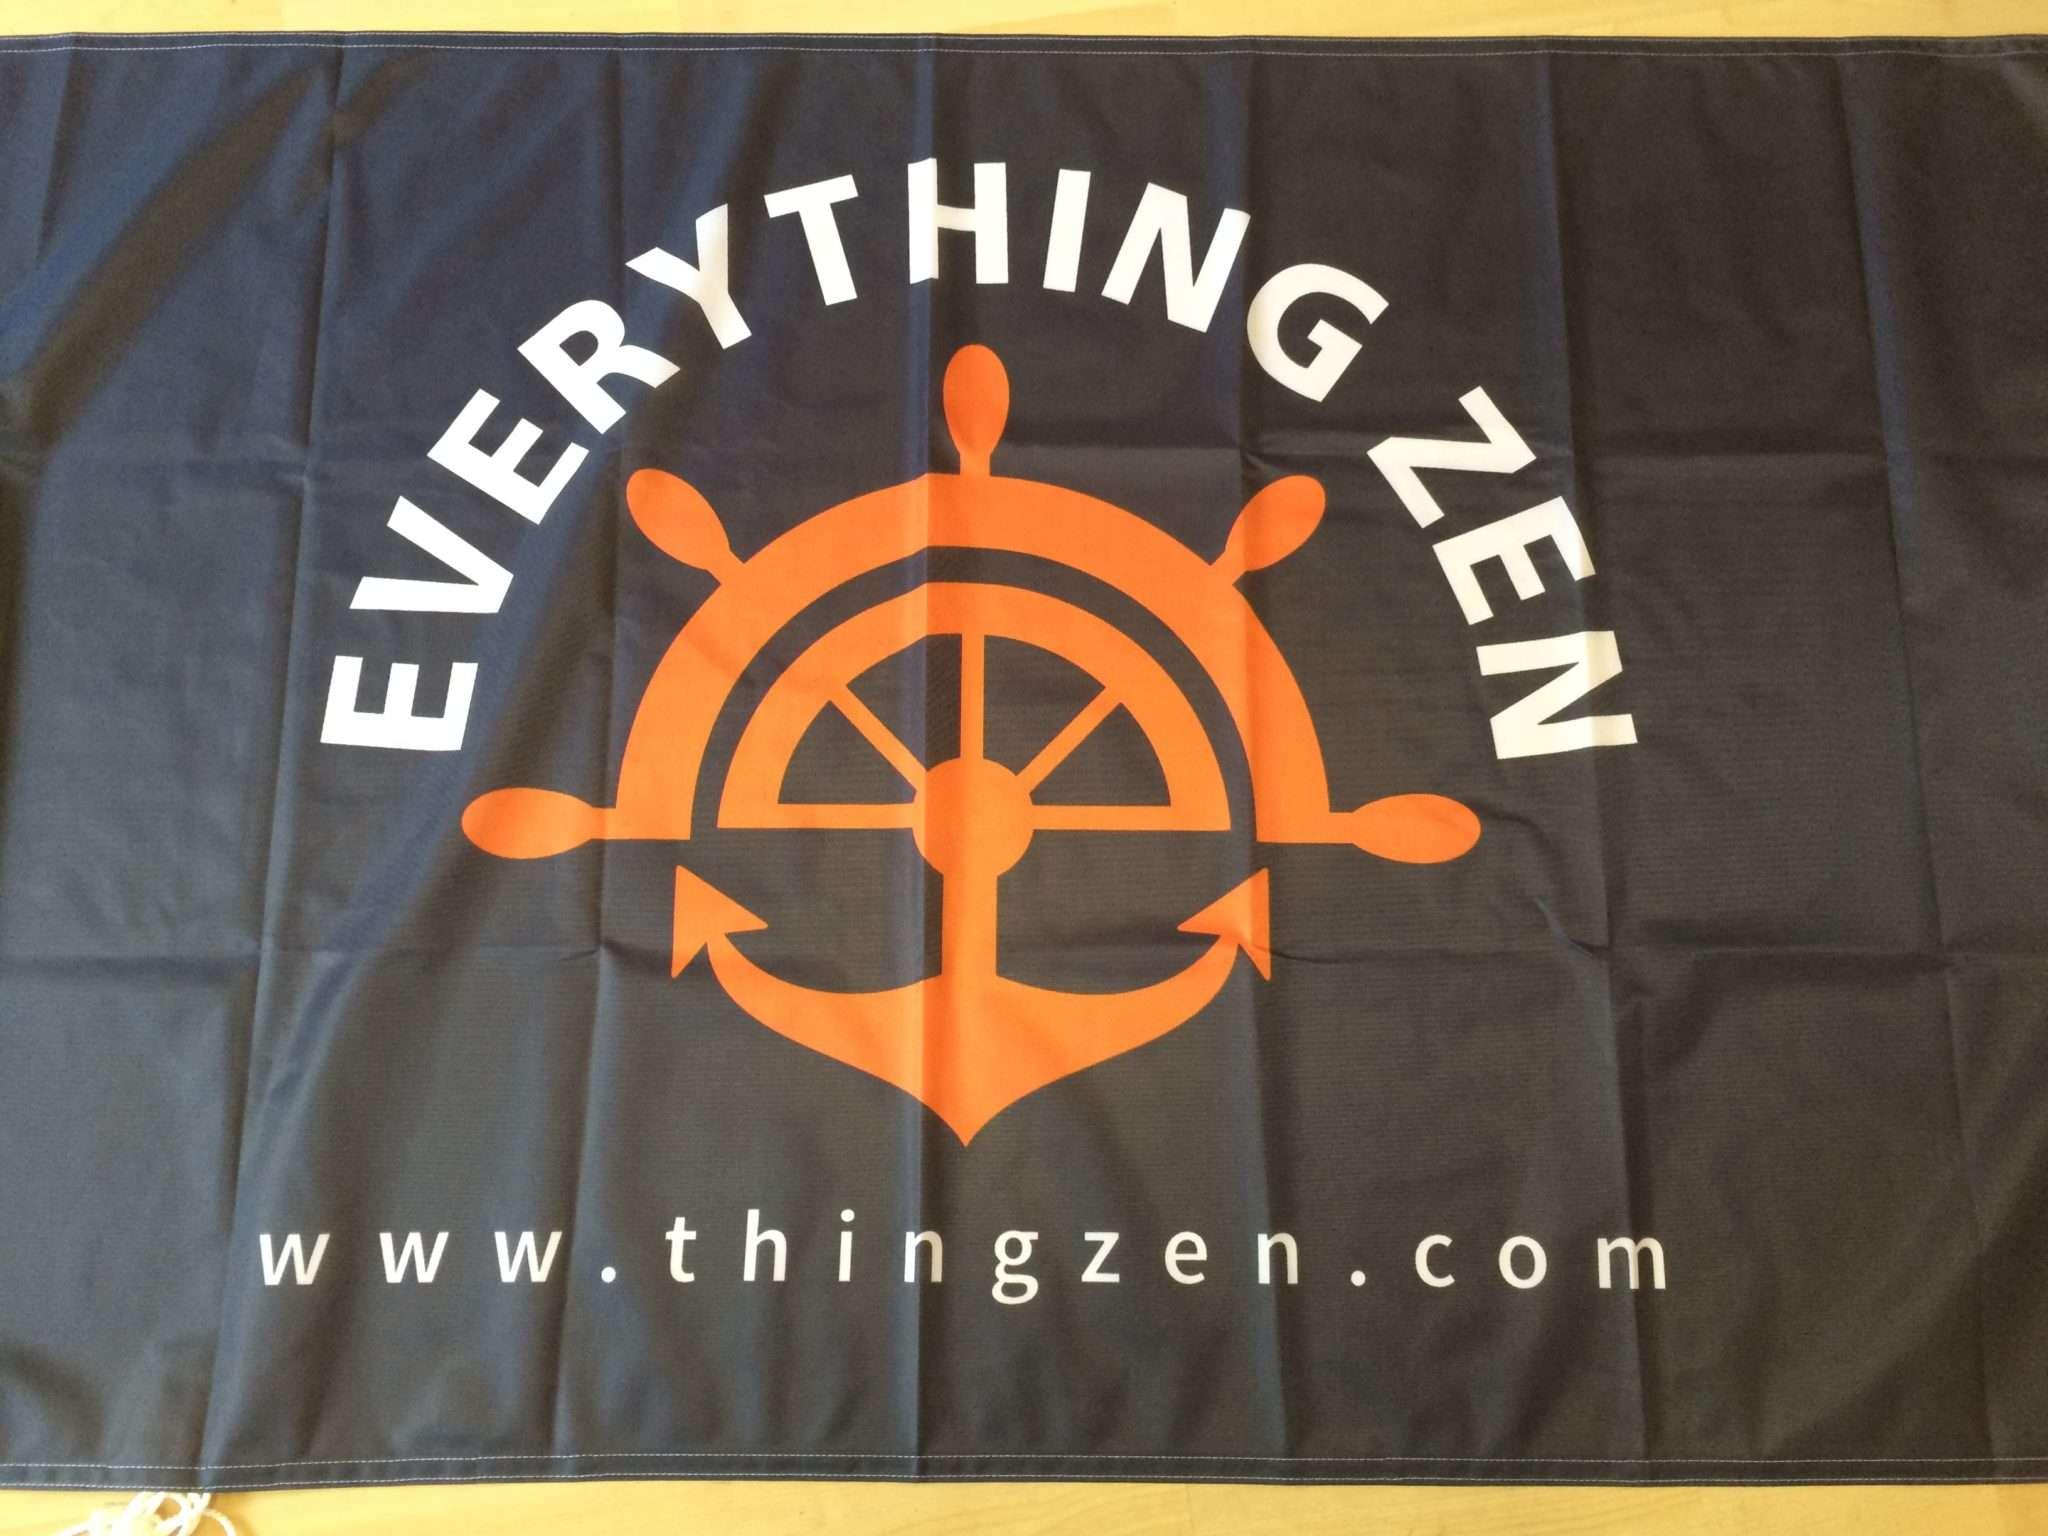 Custom Flags in 5 days